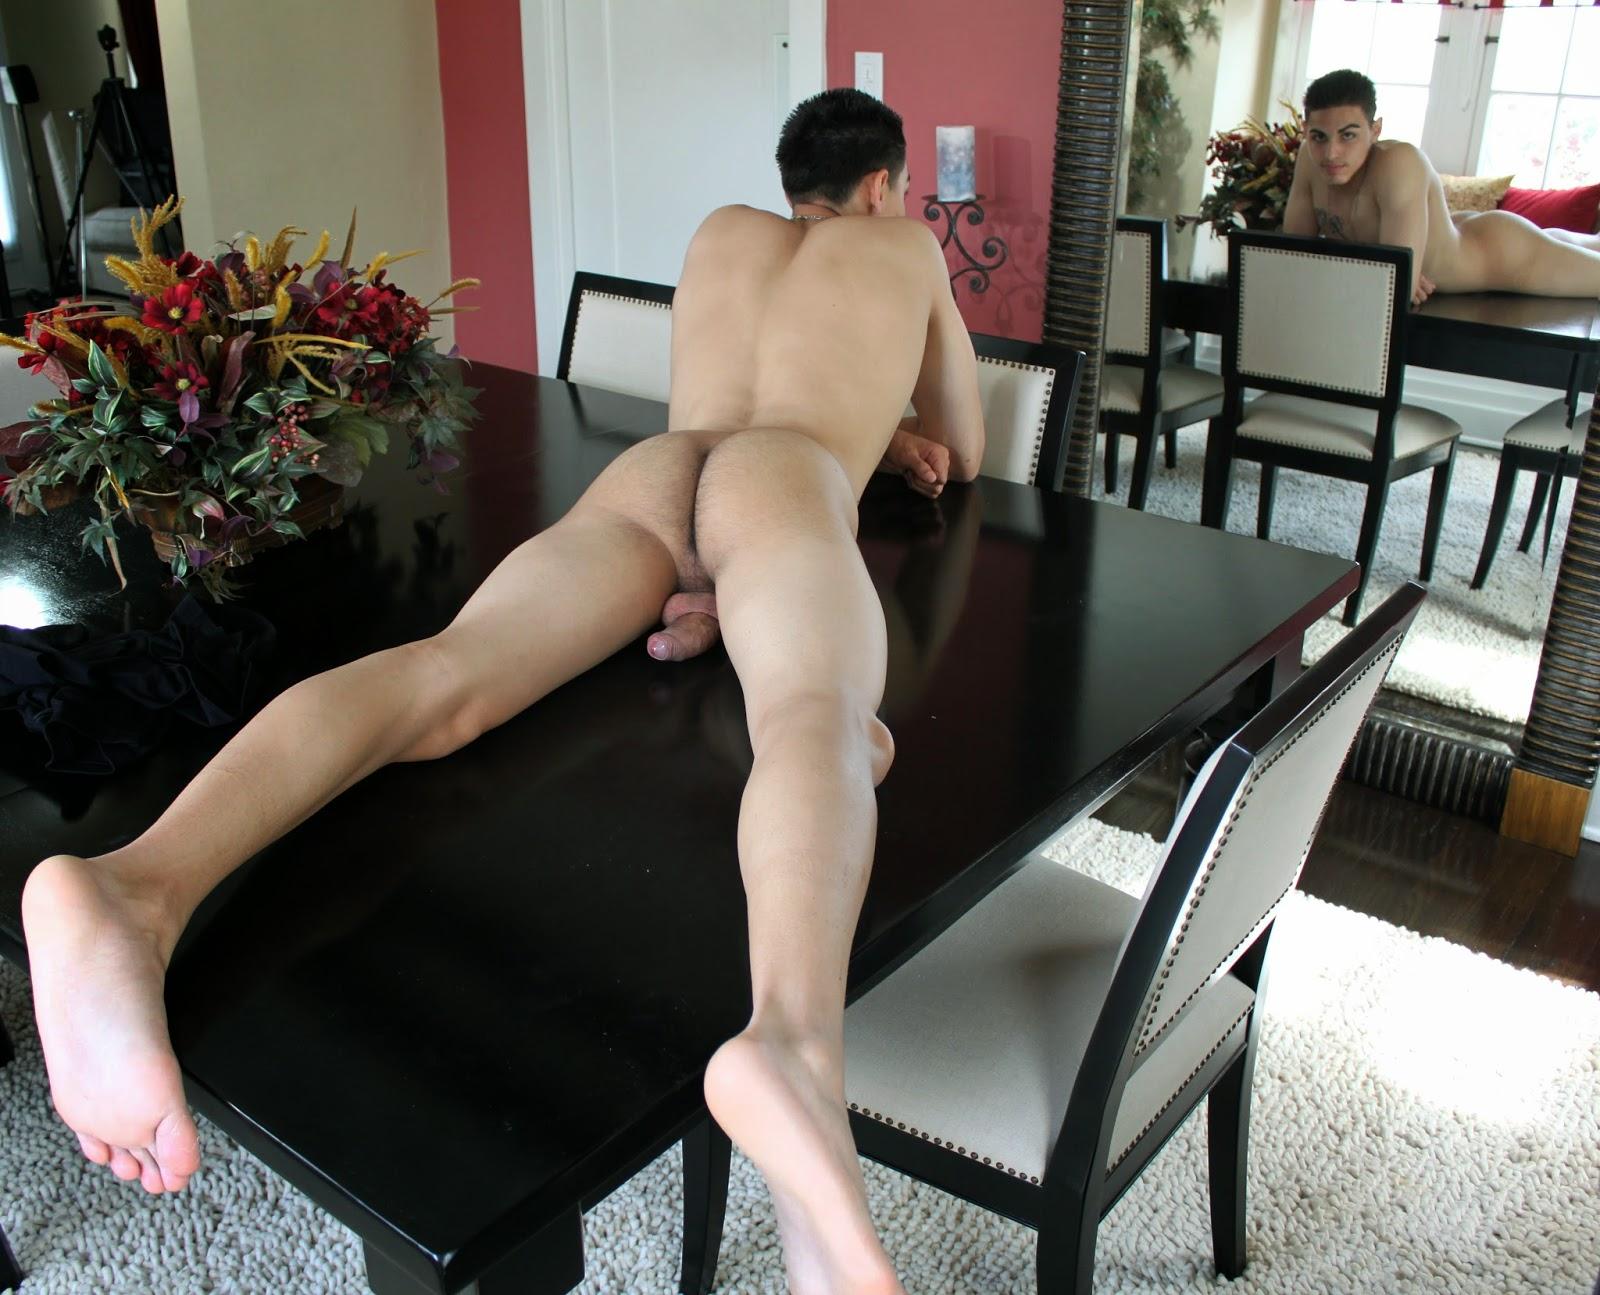 naked latin boys, latinboyz nude photos, uncut latin twinks, big latin cocks